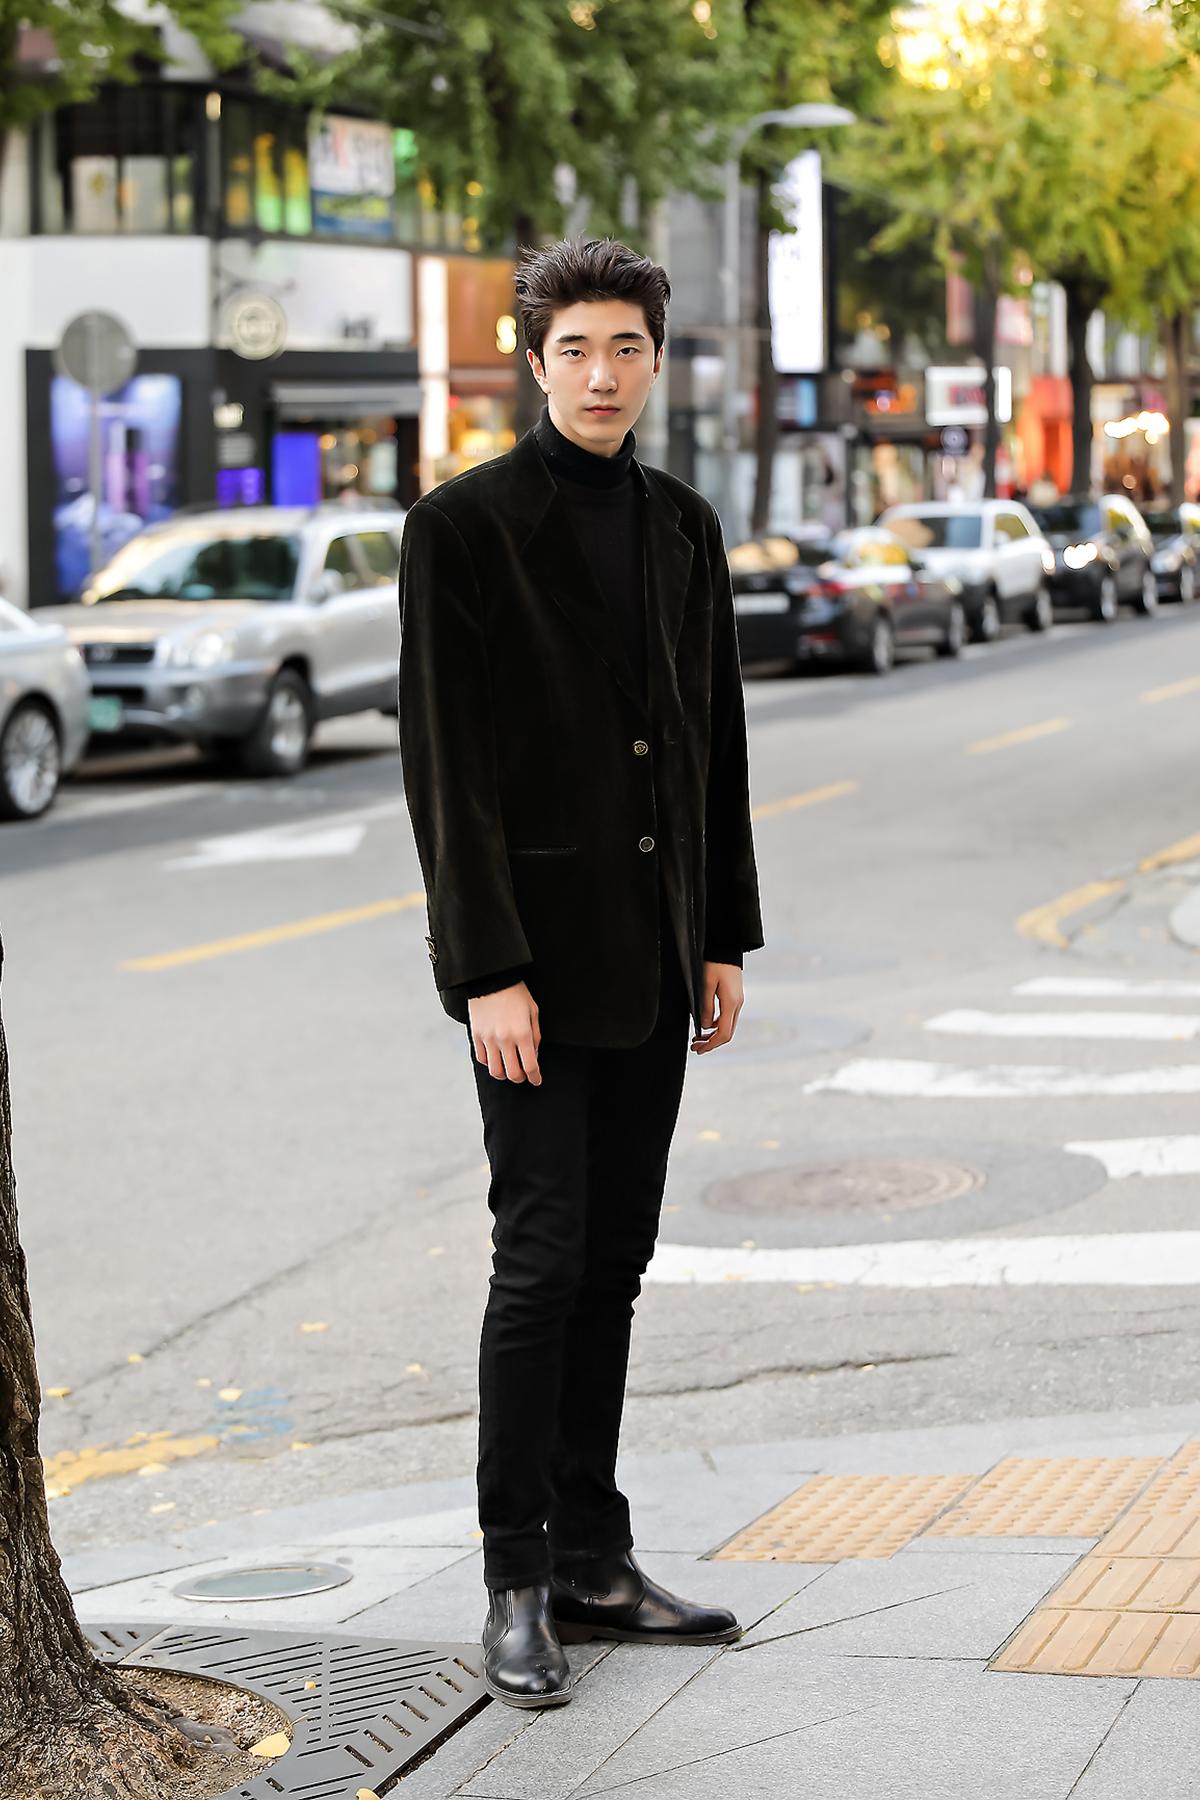 Men fall street style last week of october 2018 inseoul6